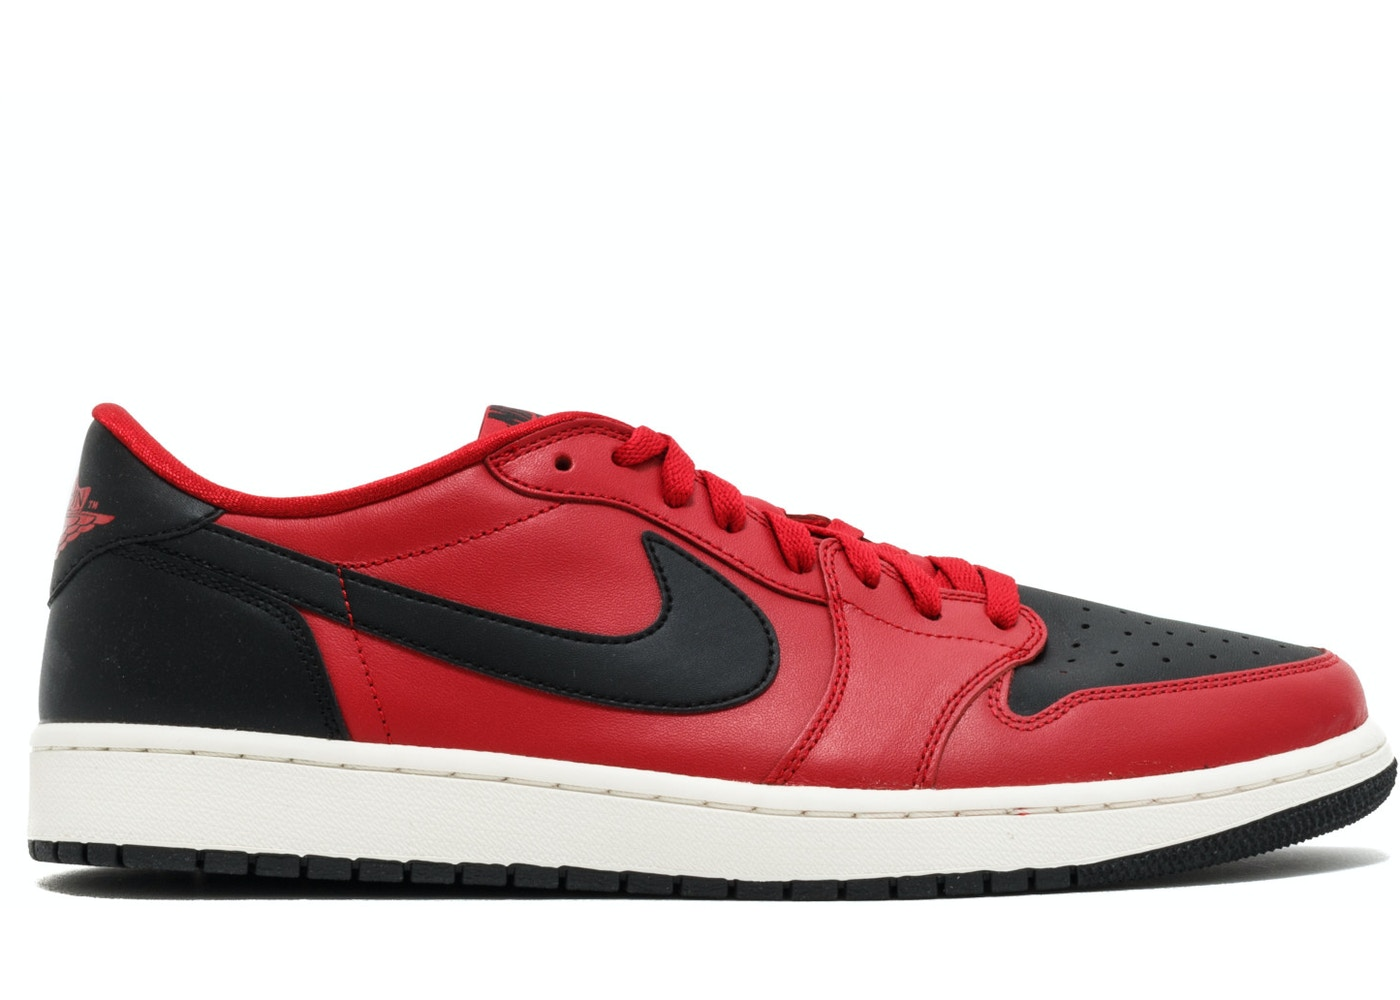 Jordan 1 Retro Low Gym Red Black 705329 601